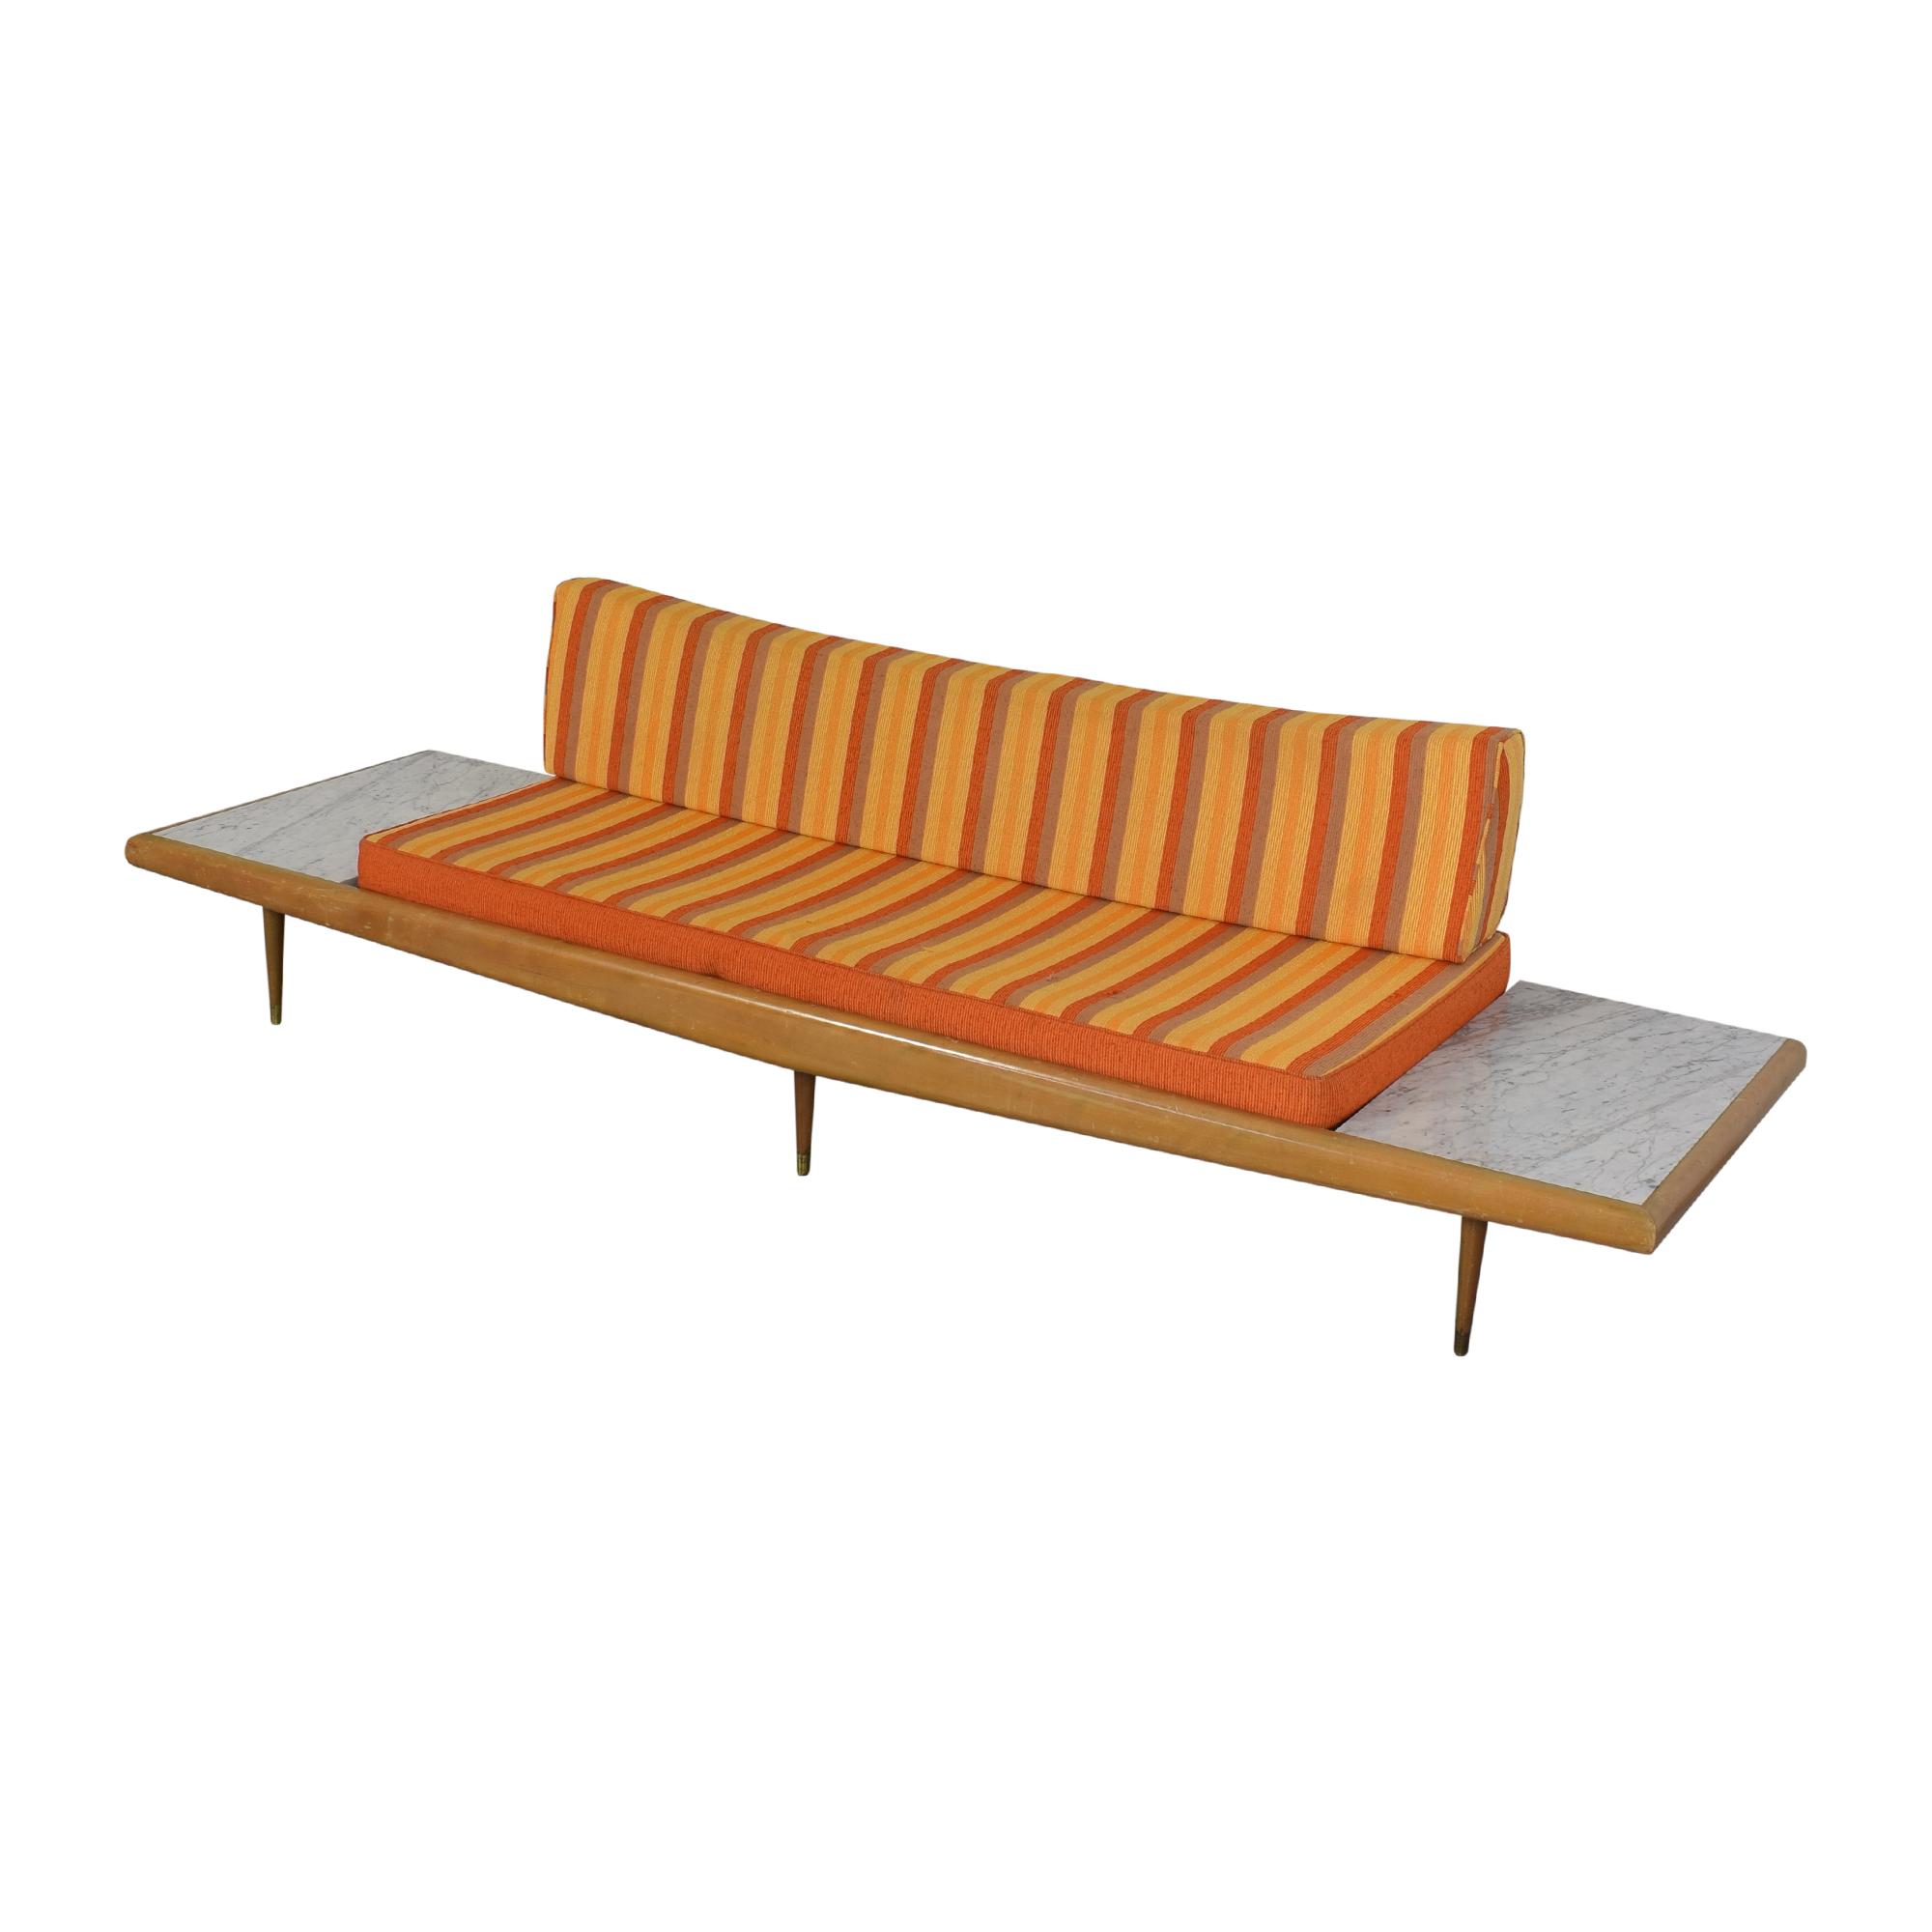 Craft Associates Craft Associates Adrian Pearsall Mid Century Sofa dimensions